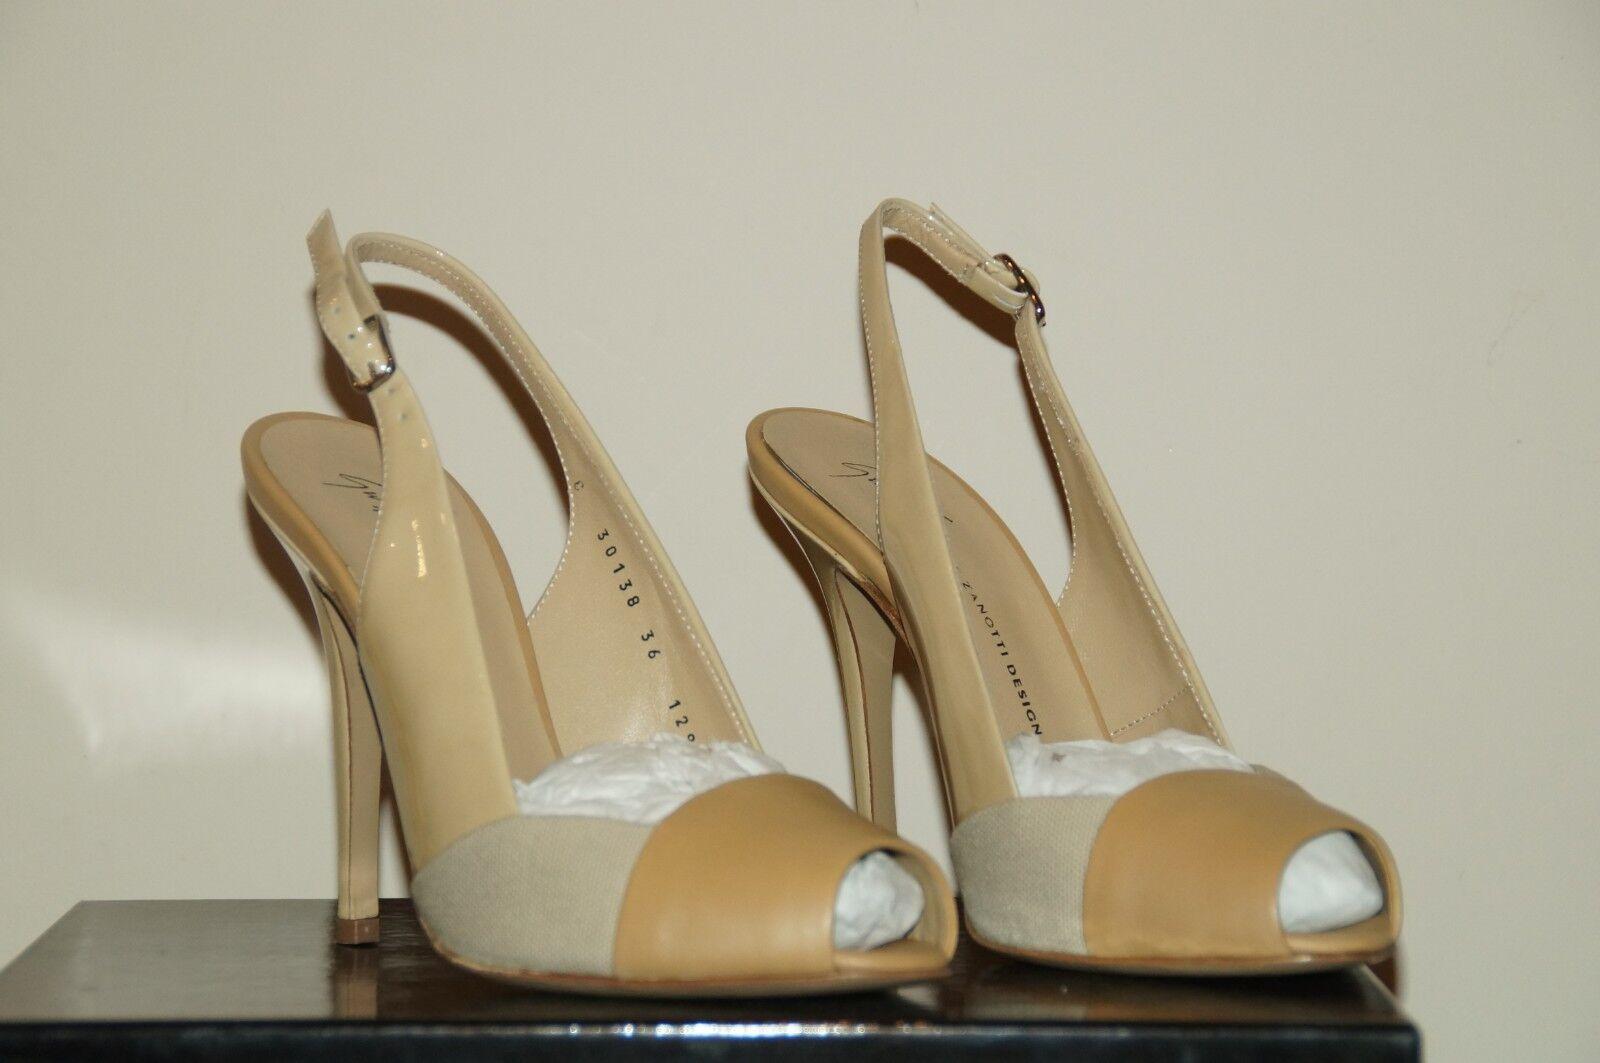 Giuseppe Zanotti Kalifa US 6 EU 36 Peep-Toe Leather Slingback Pump shoes NIB